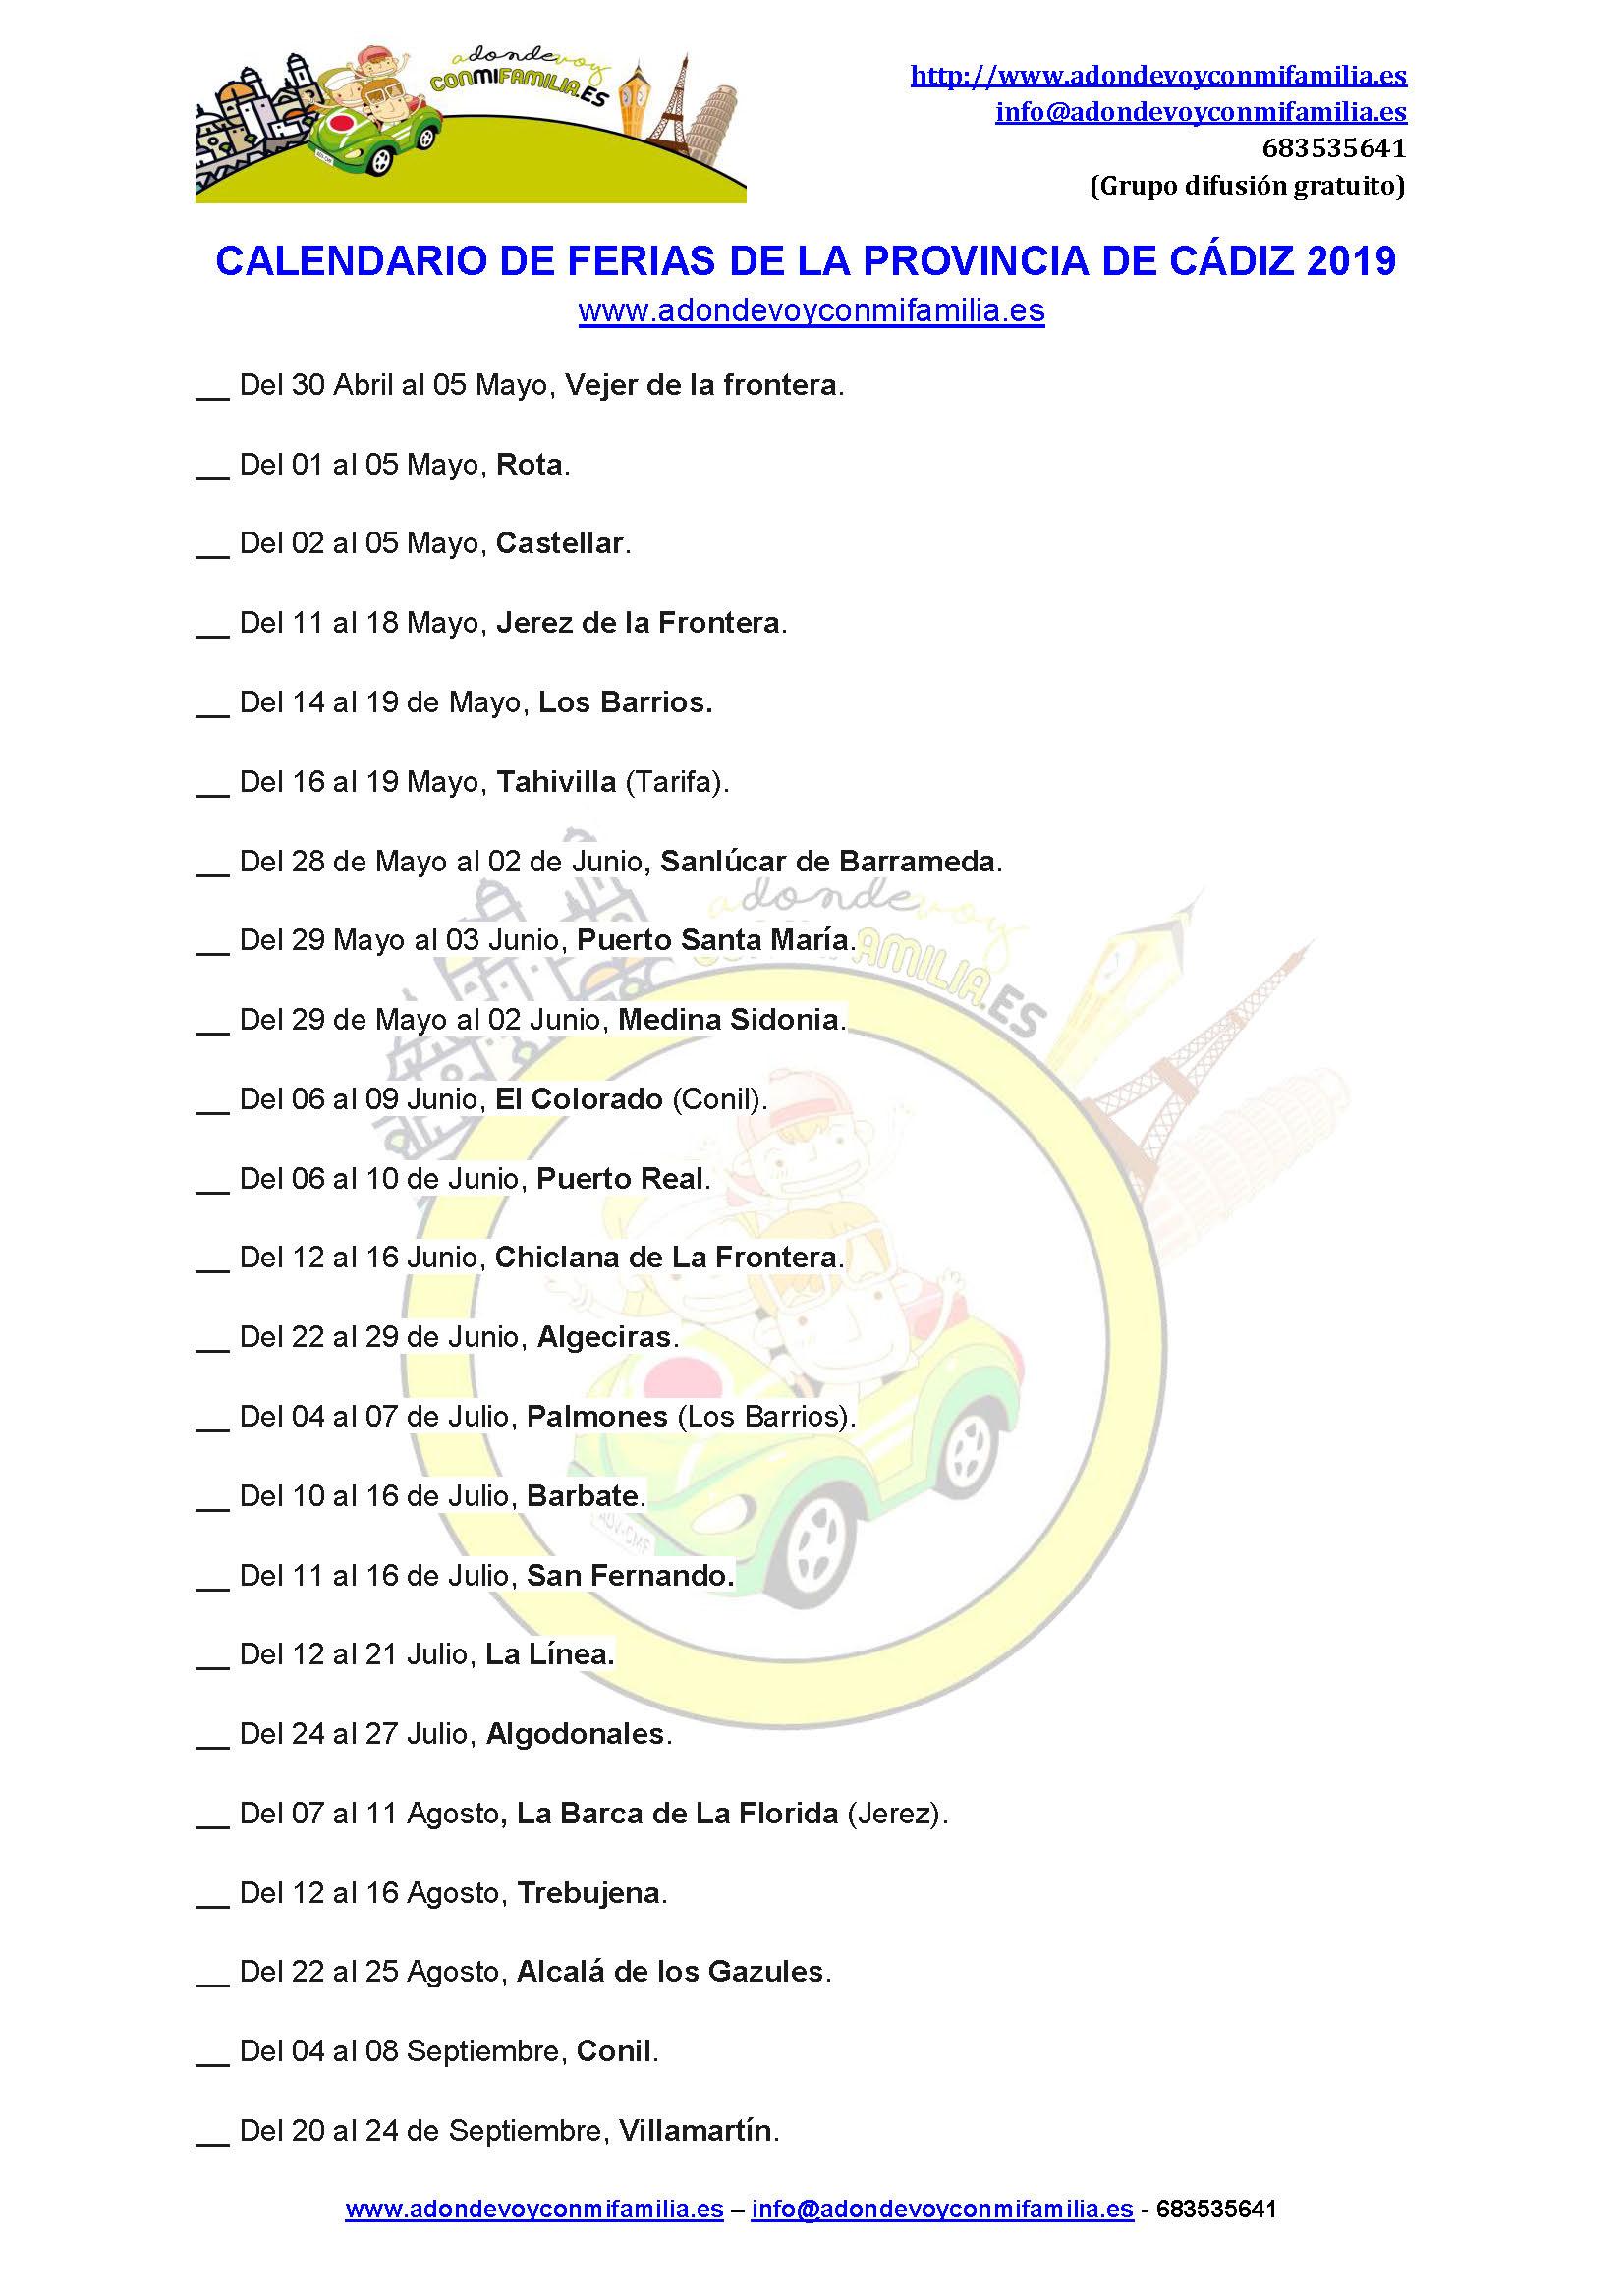 Calendario De Ferias De La Provincia De Cádiz 2019 adondevoyconmifamilia